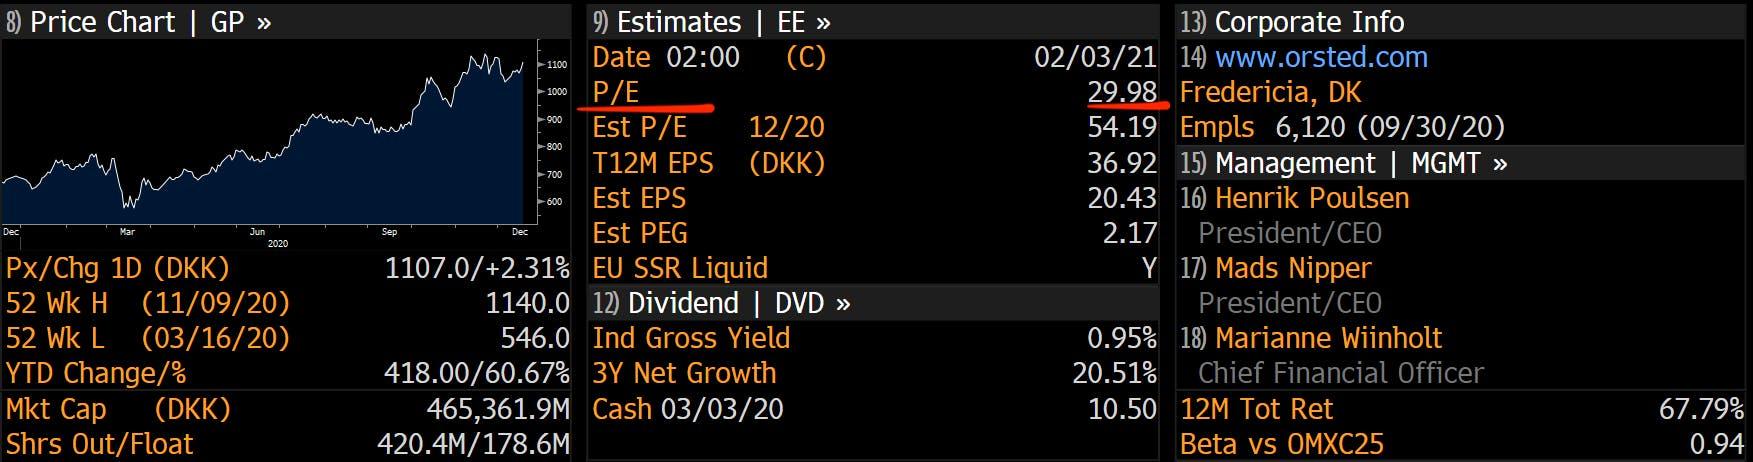 Ørsted share price forecast